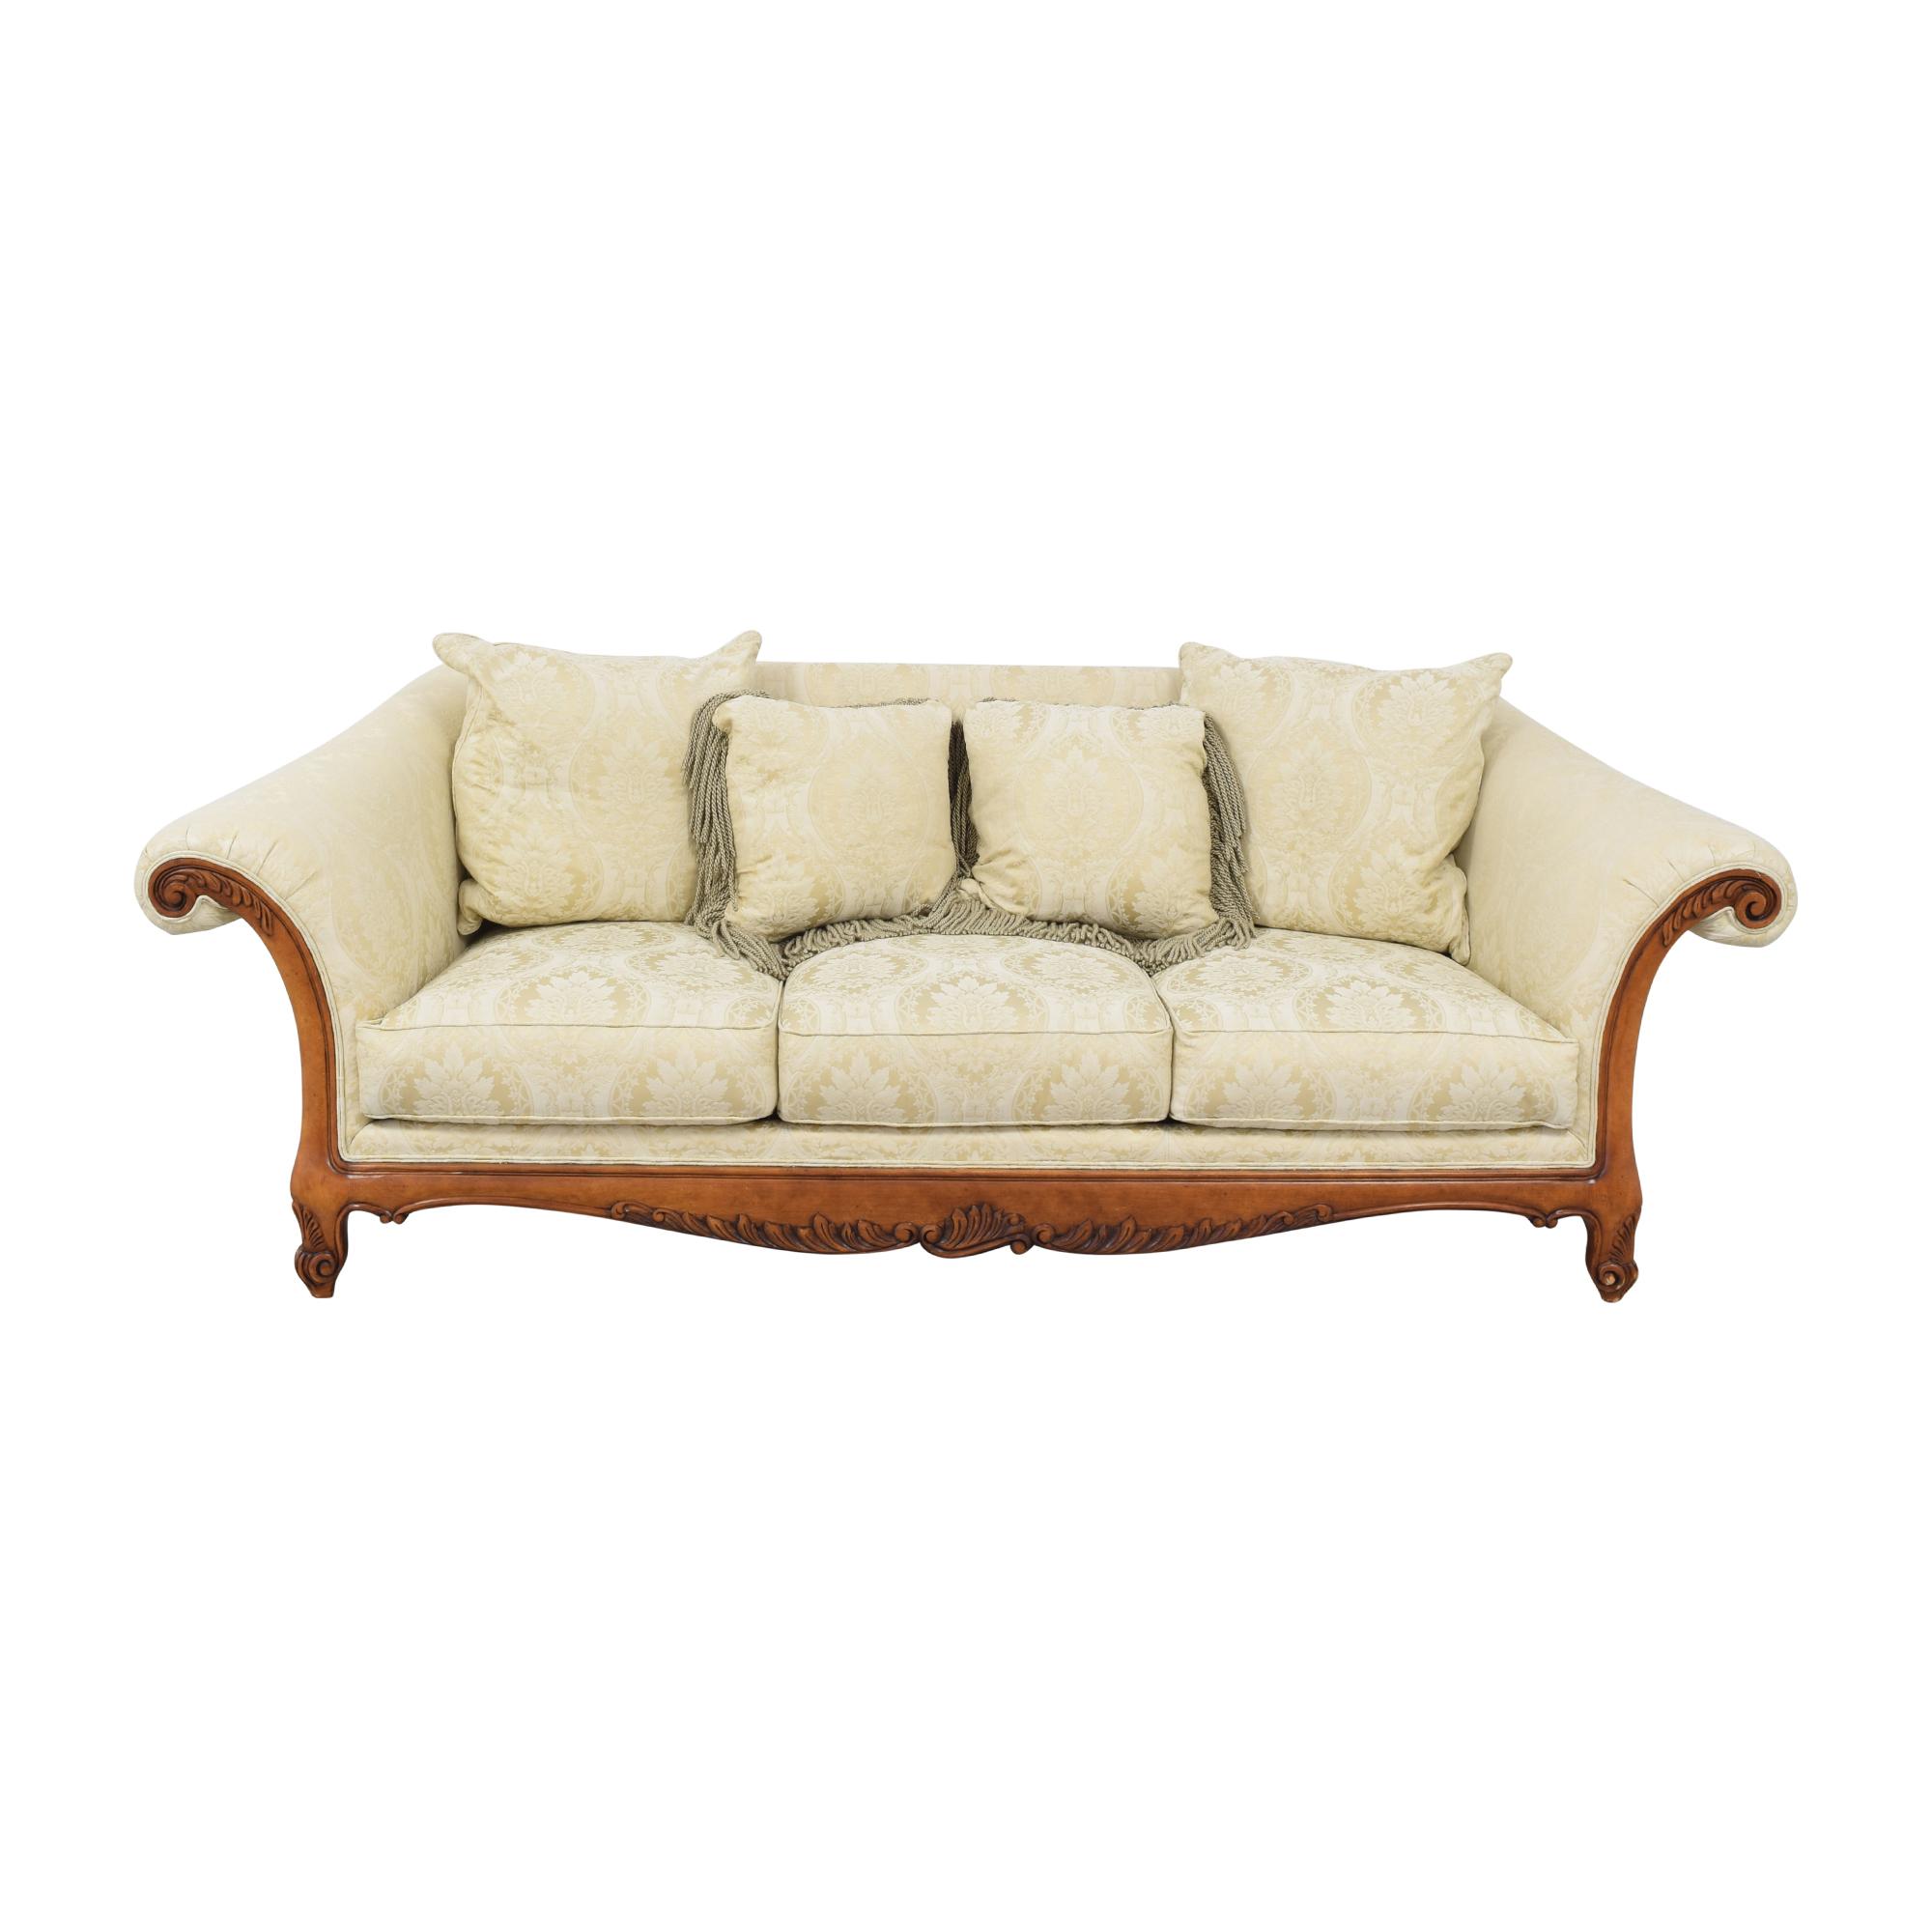 Henredon Furniture Henredon Furniture Vintage Roll Arm Sofa ma